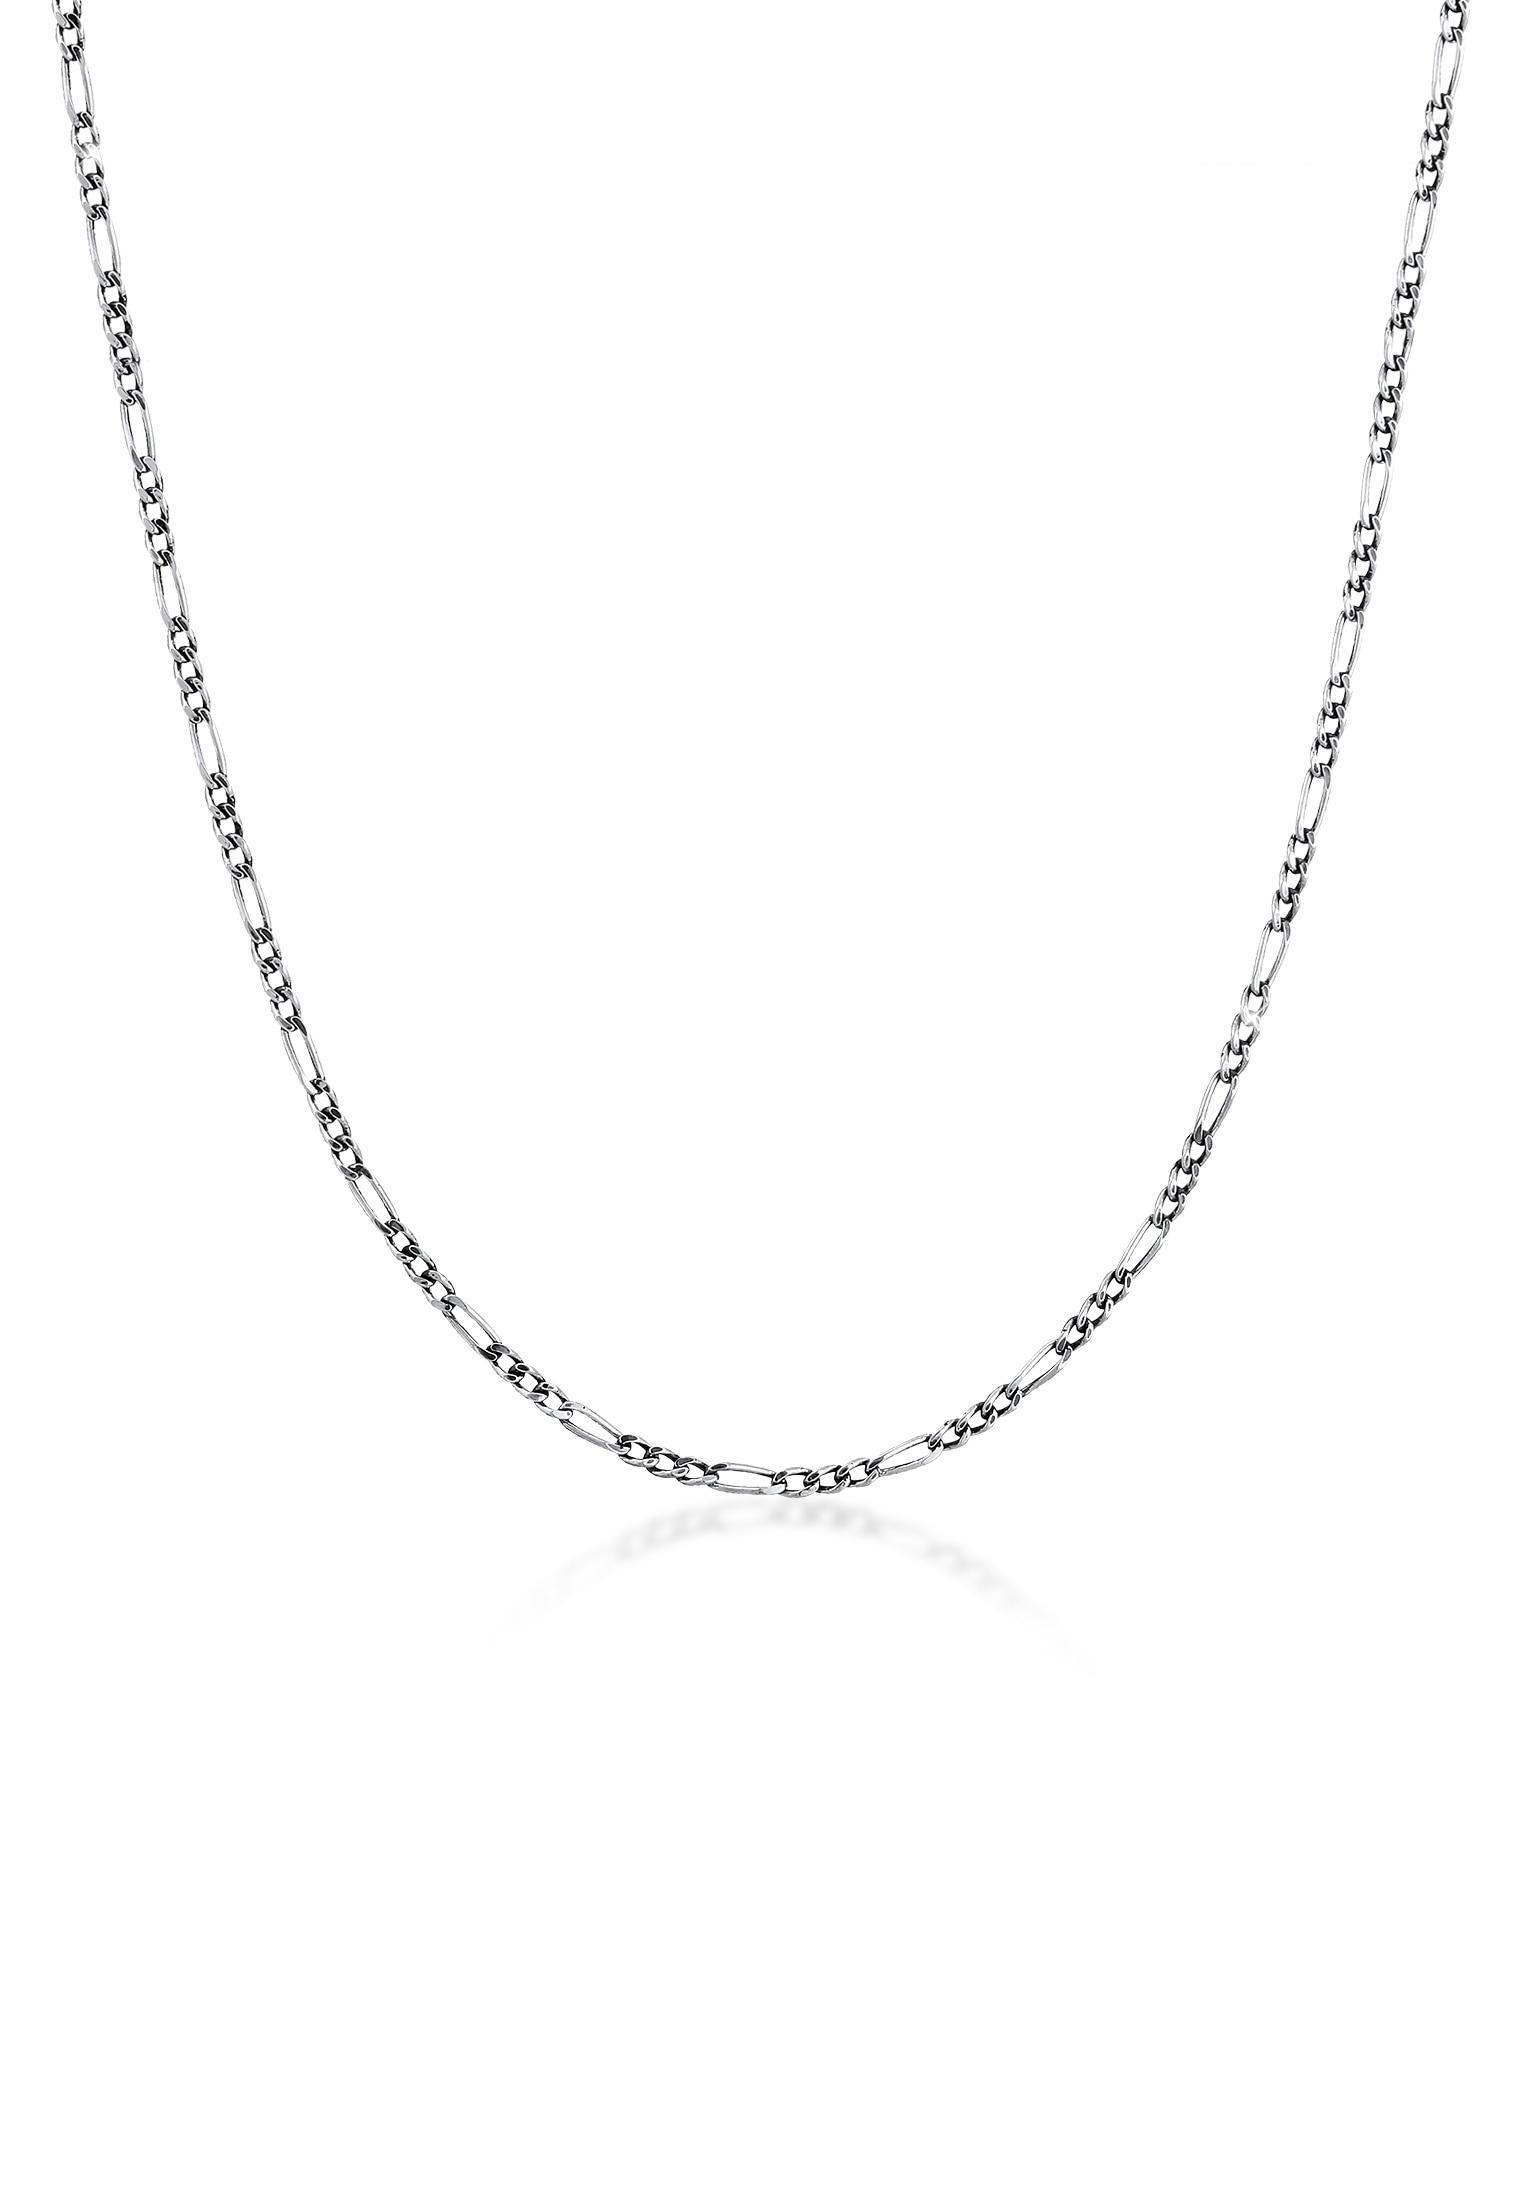 Kuzzoi Silberkette Herrn Figaro Oxidiert Massiv Mann 925 Silber | Schmuck > Halsketten > Silberketten | Kuzzoi